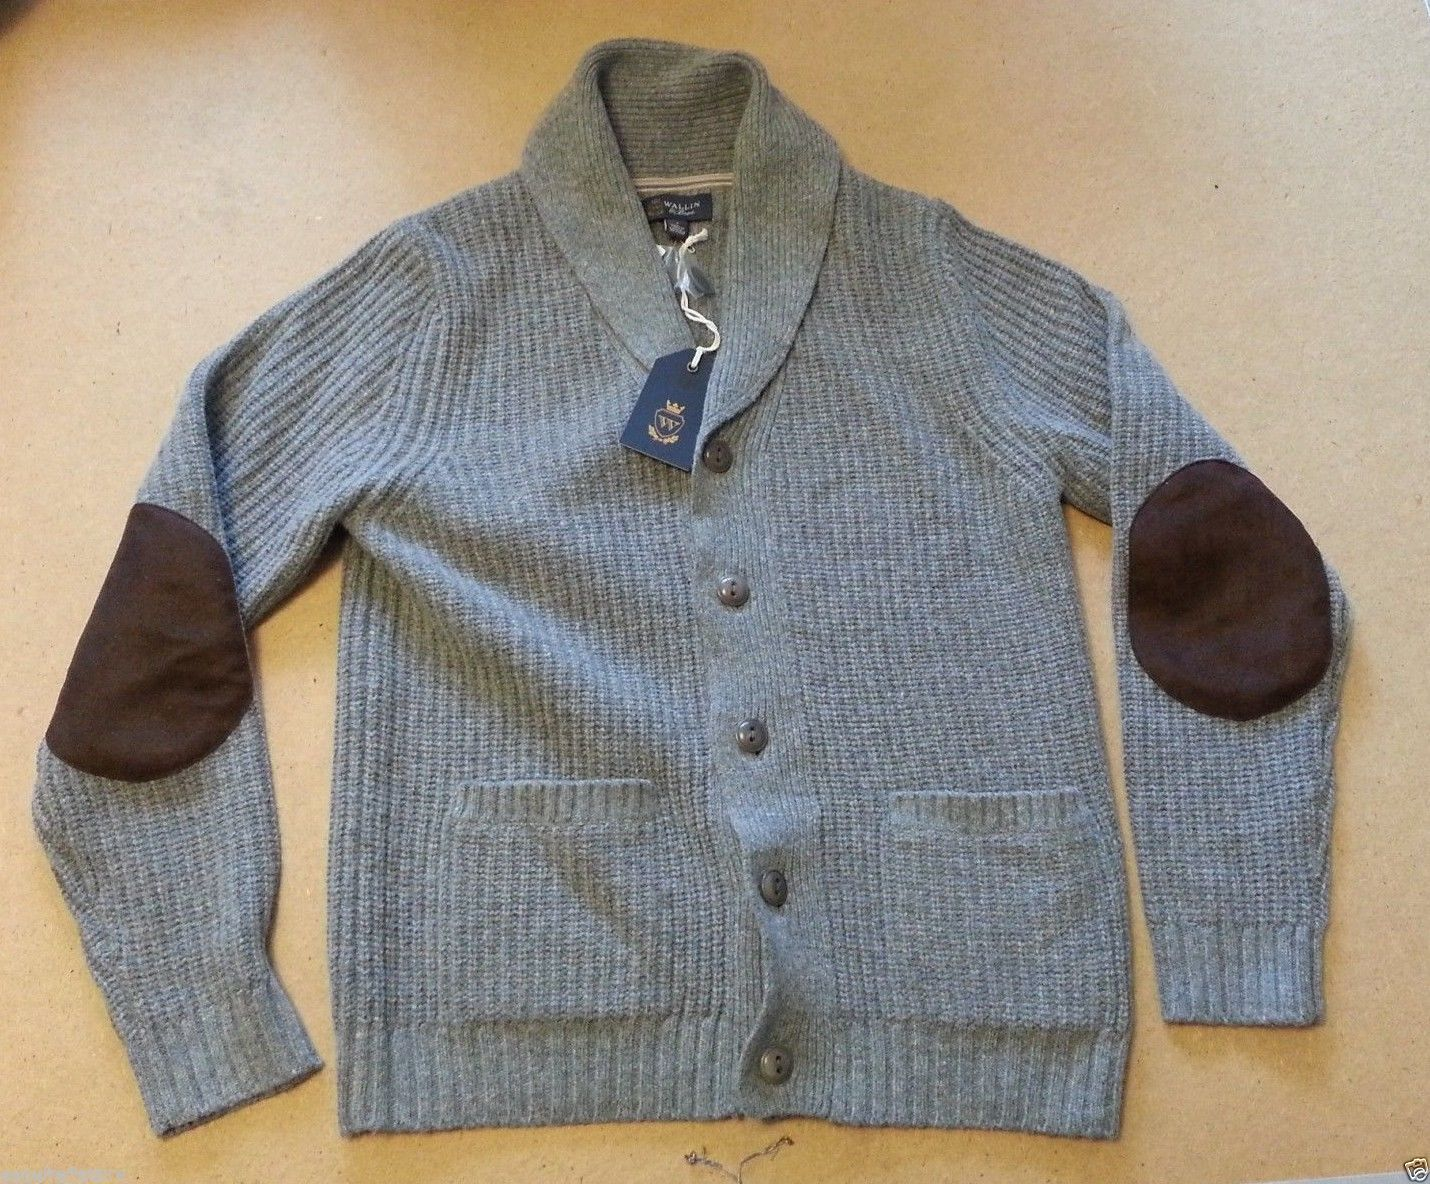 sweater WALLIN | Men Sweaters | Pinterest | Gardens, Surf and ...